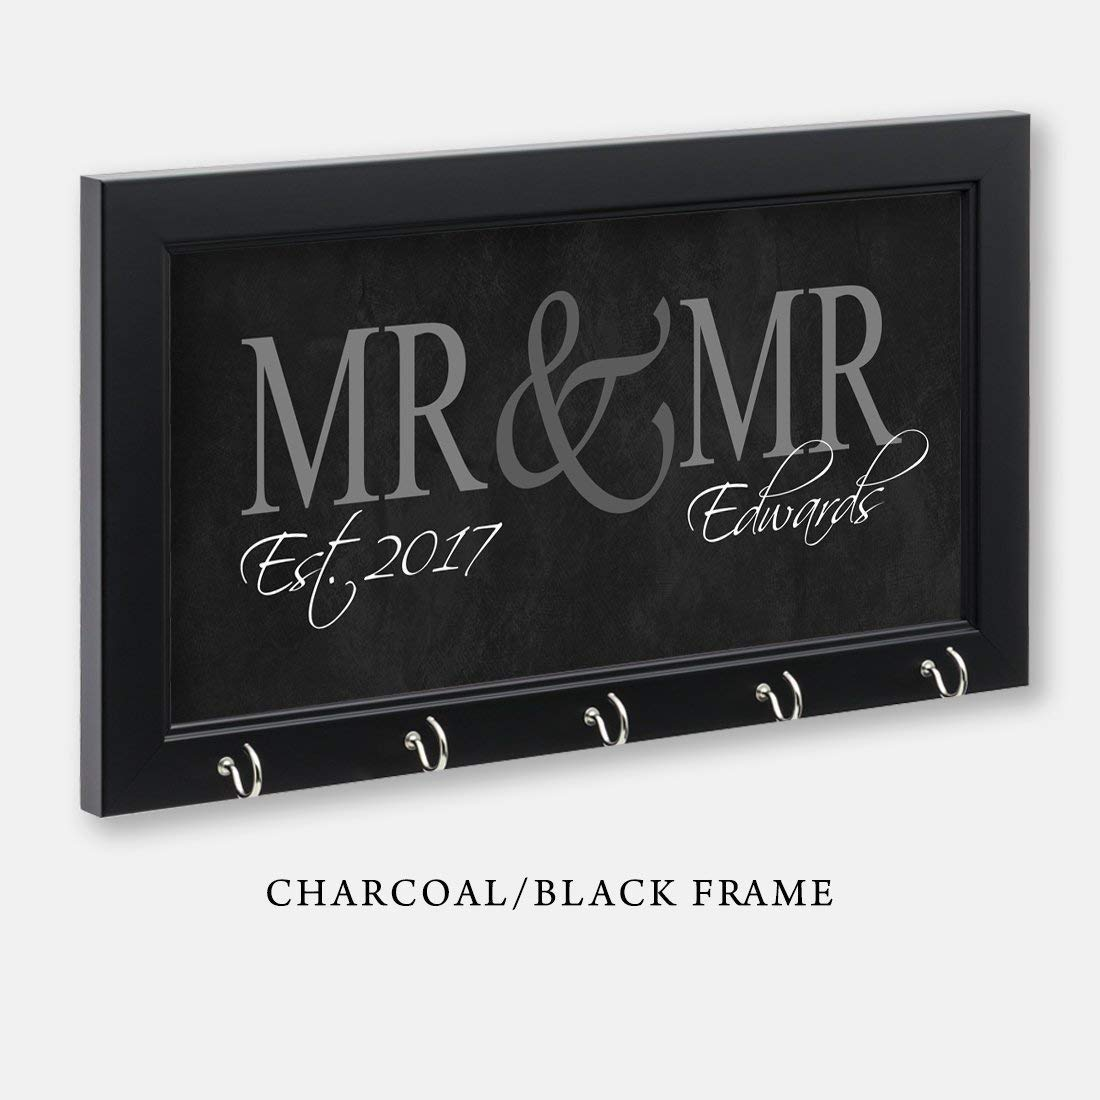 Mr & Mr Key Holder, Gay Gift, Gay Wedding Gift, Key Hanger, Wall Key Rack, Wall Key Holder, Key Holders, Personalized Gift, Home, Housewarming Gift, Wedding Gift